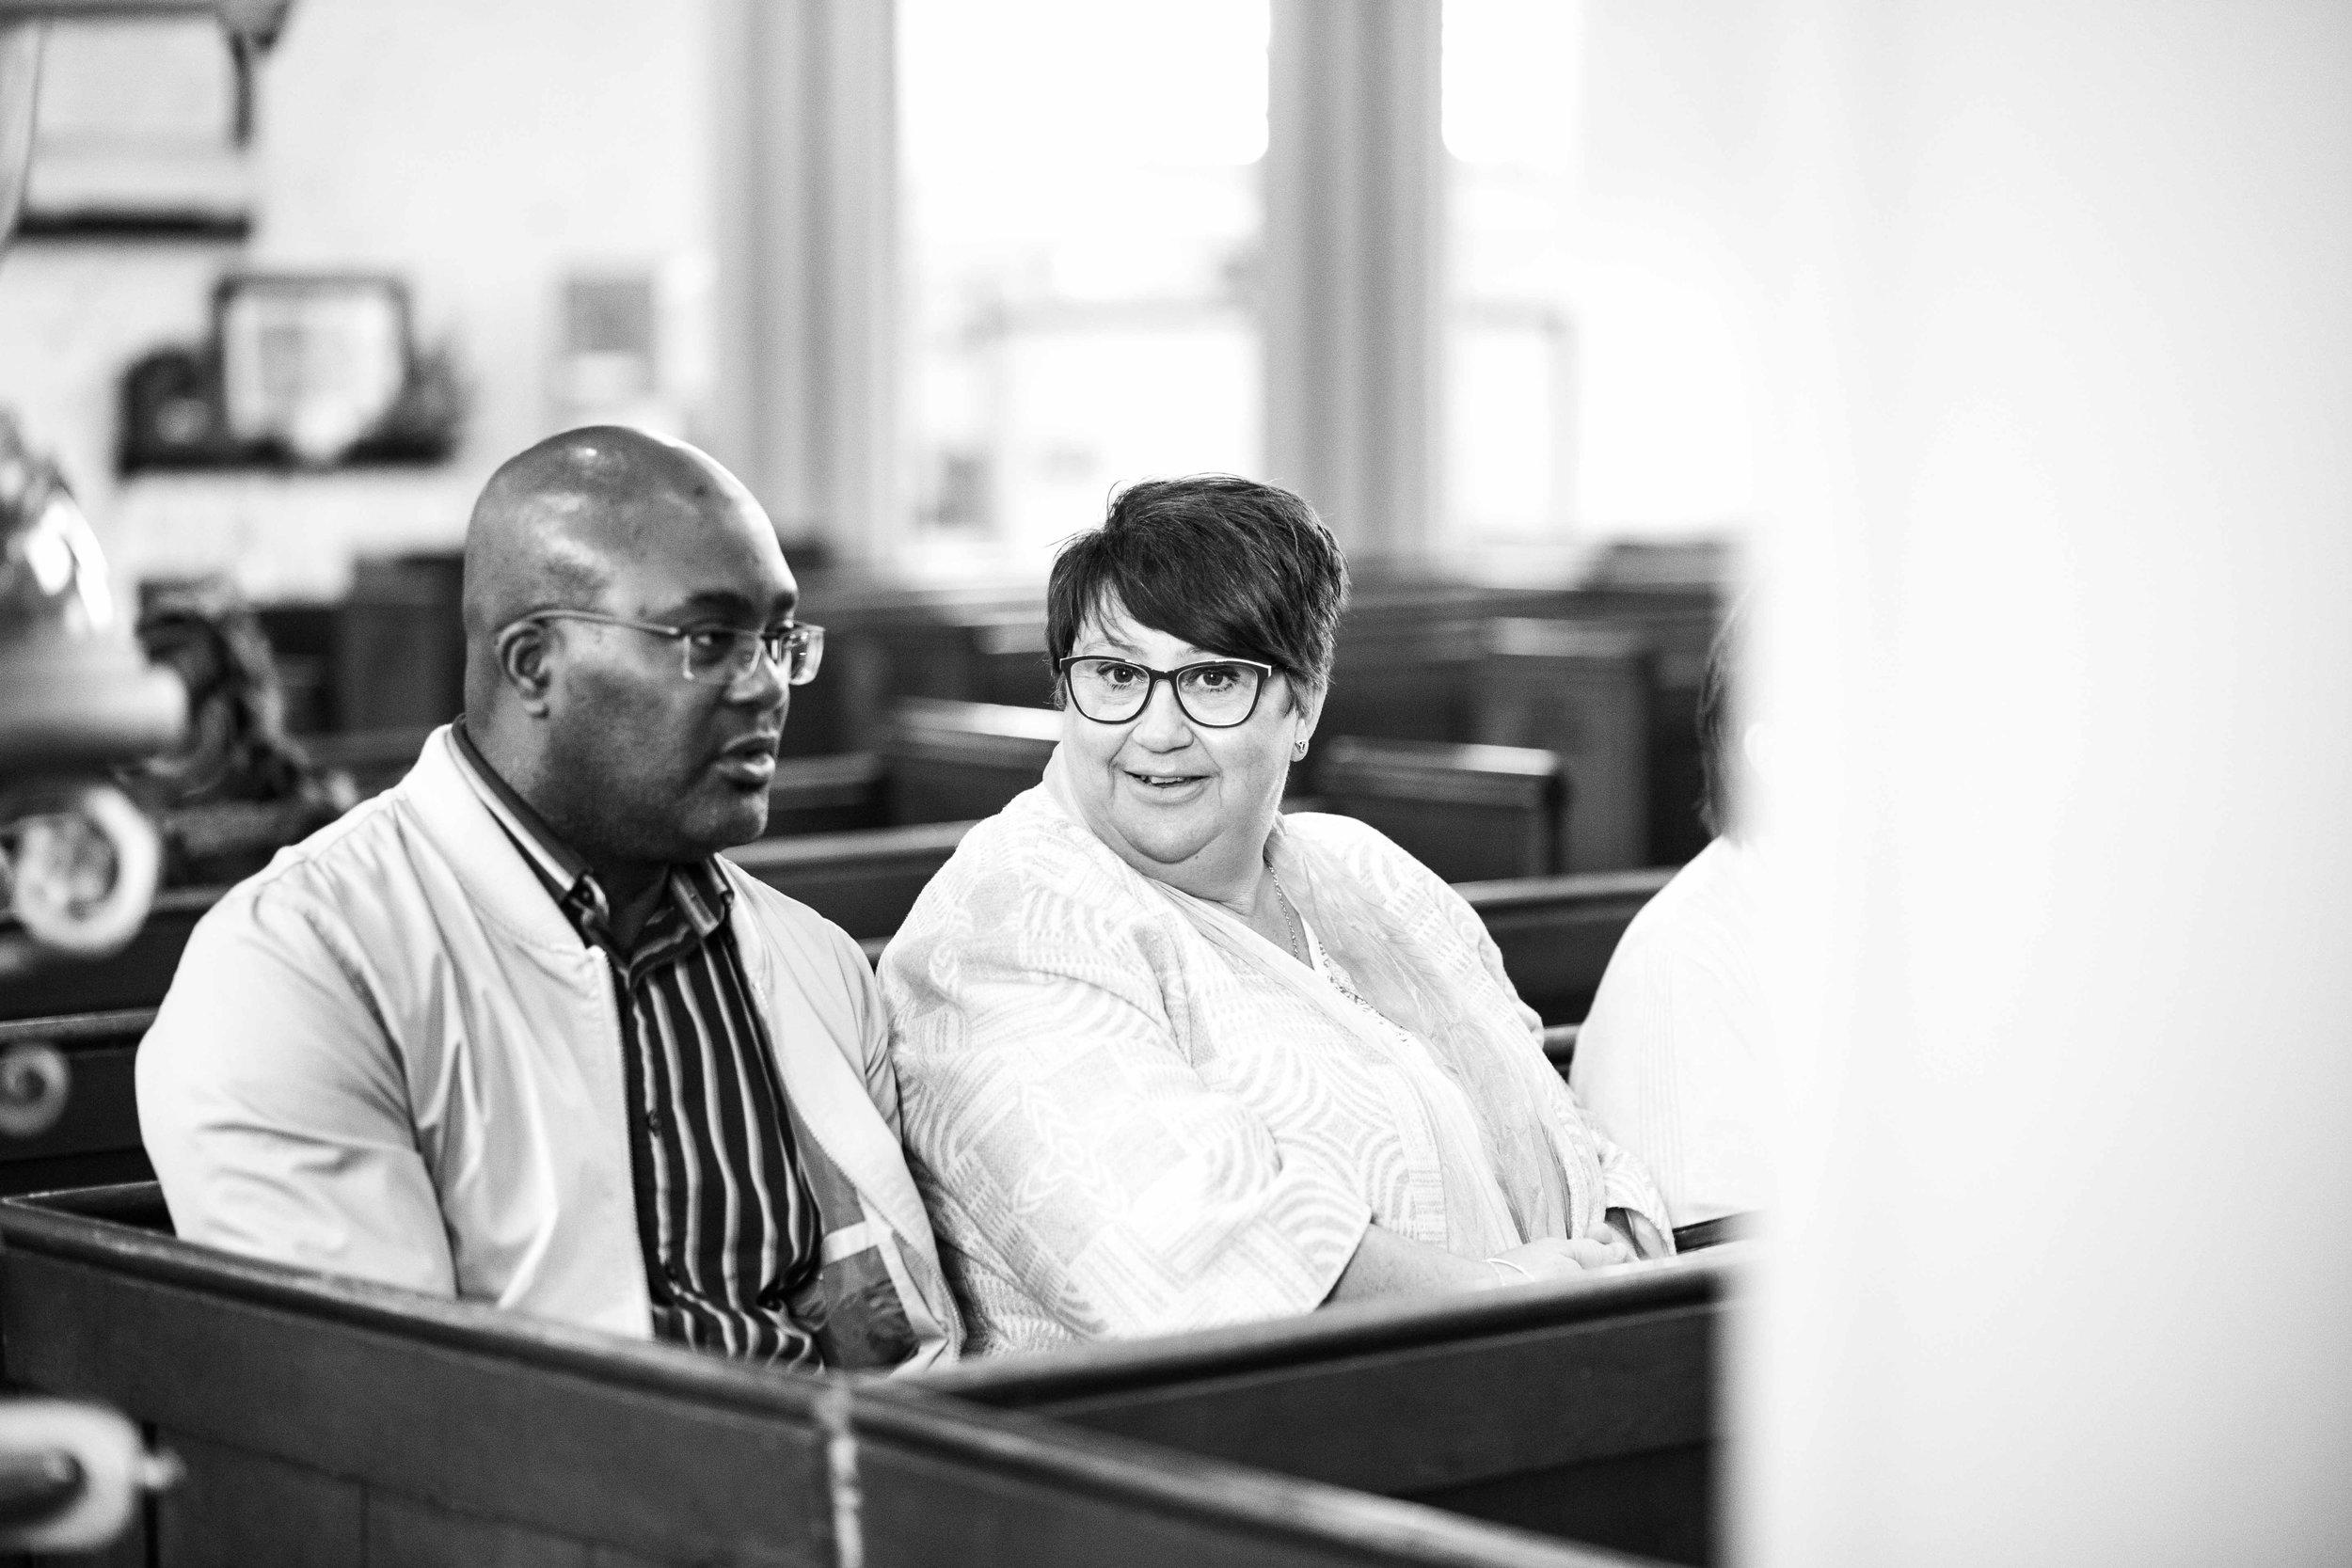 Lea-cooper-photography-christening-photographer-baptism-wolverhampton-wednesbury-walsall-willenhall-dudley-church-chapel-event-photography-3.jpg